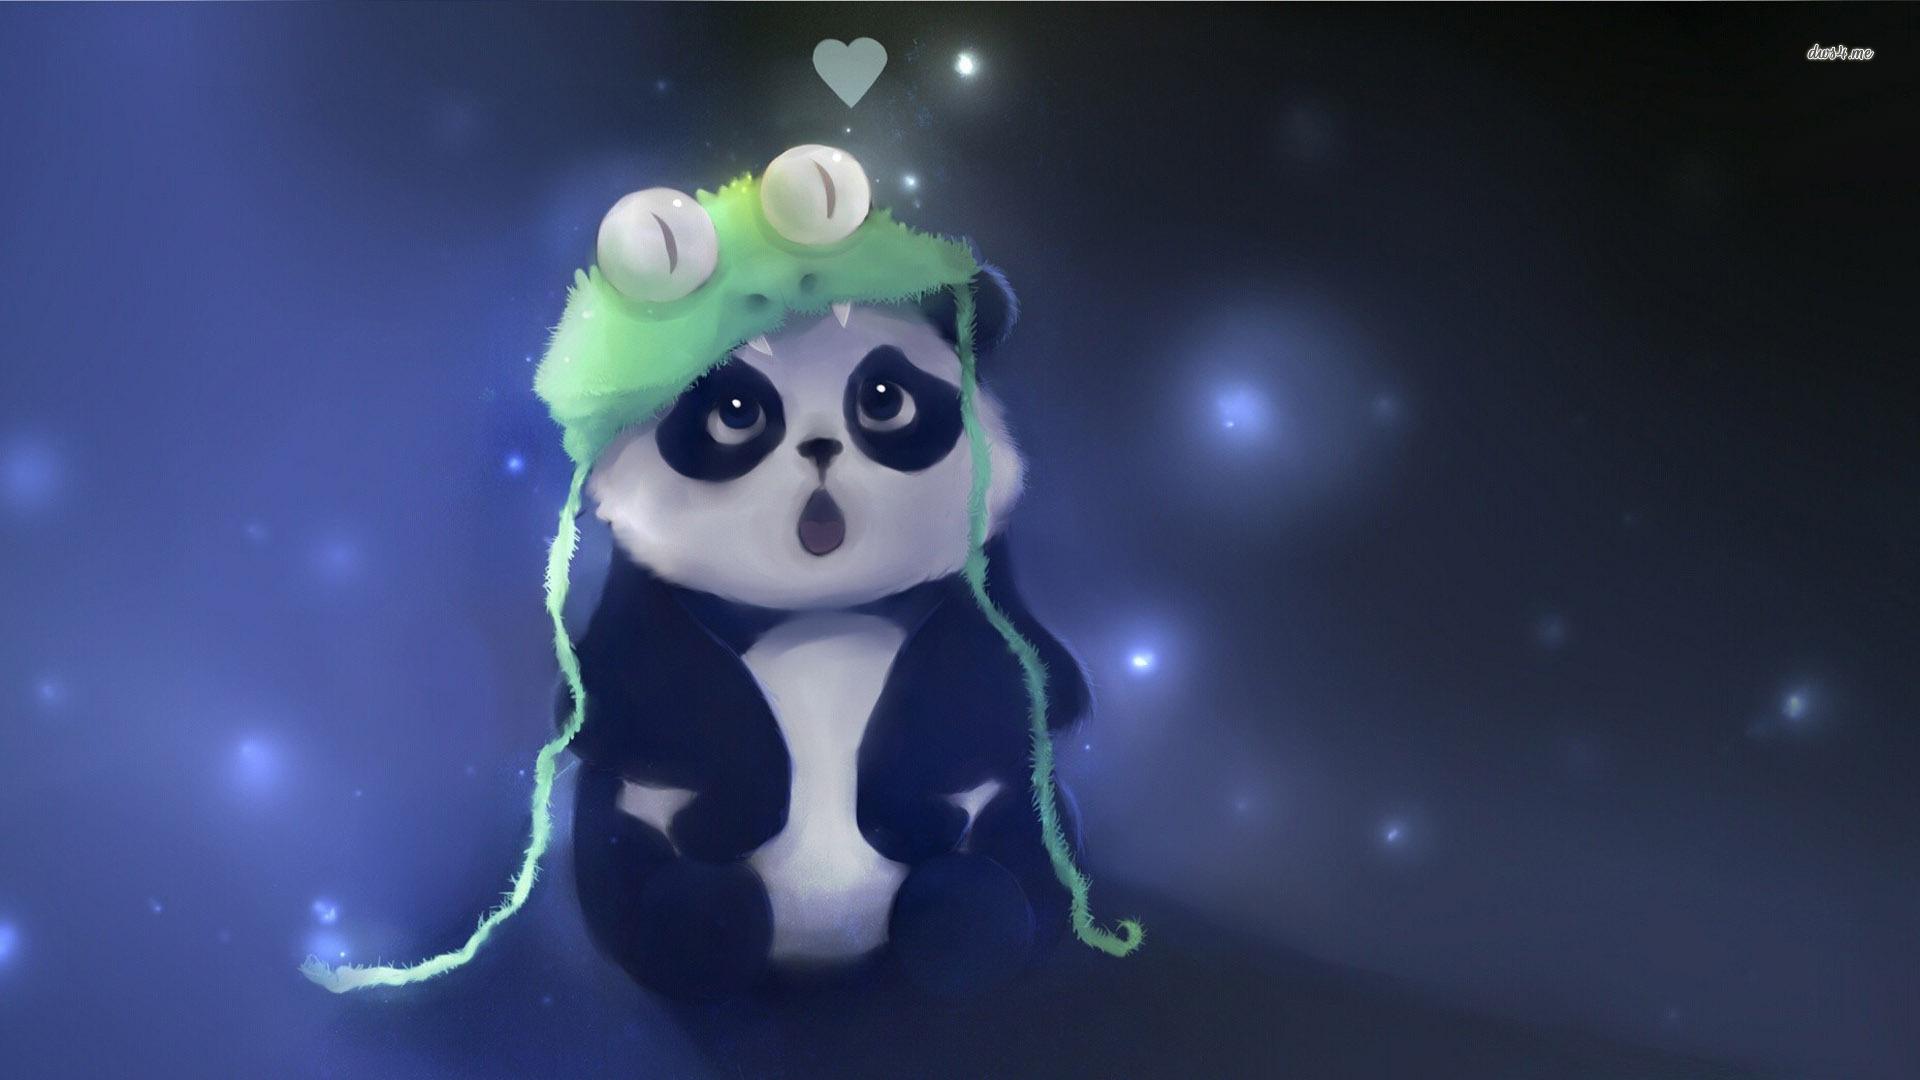 Cartoon Panda Wallpapers Wallpapersafari